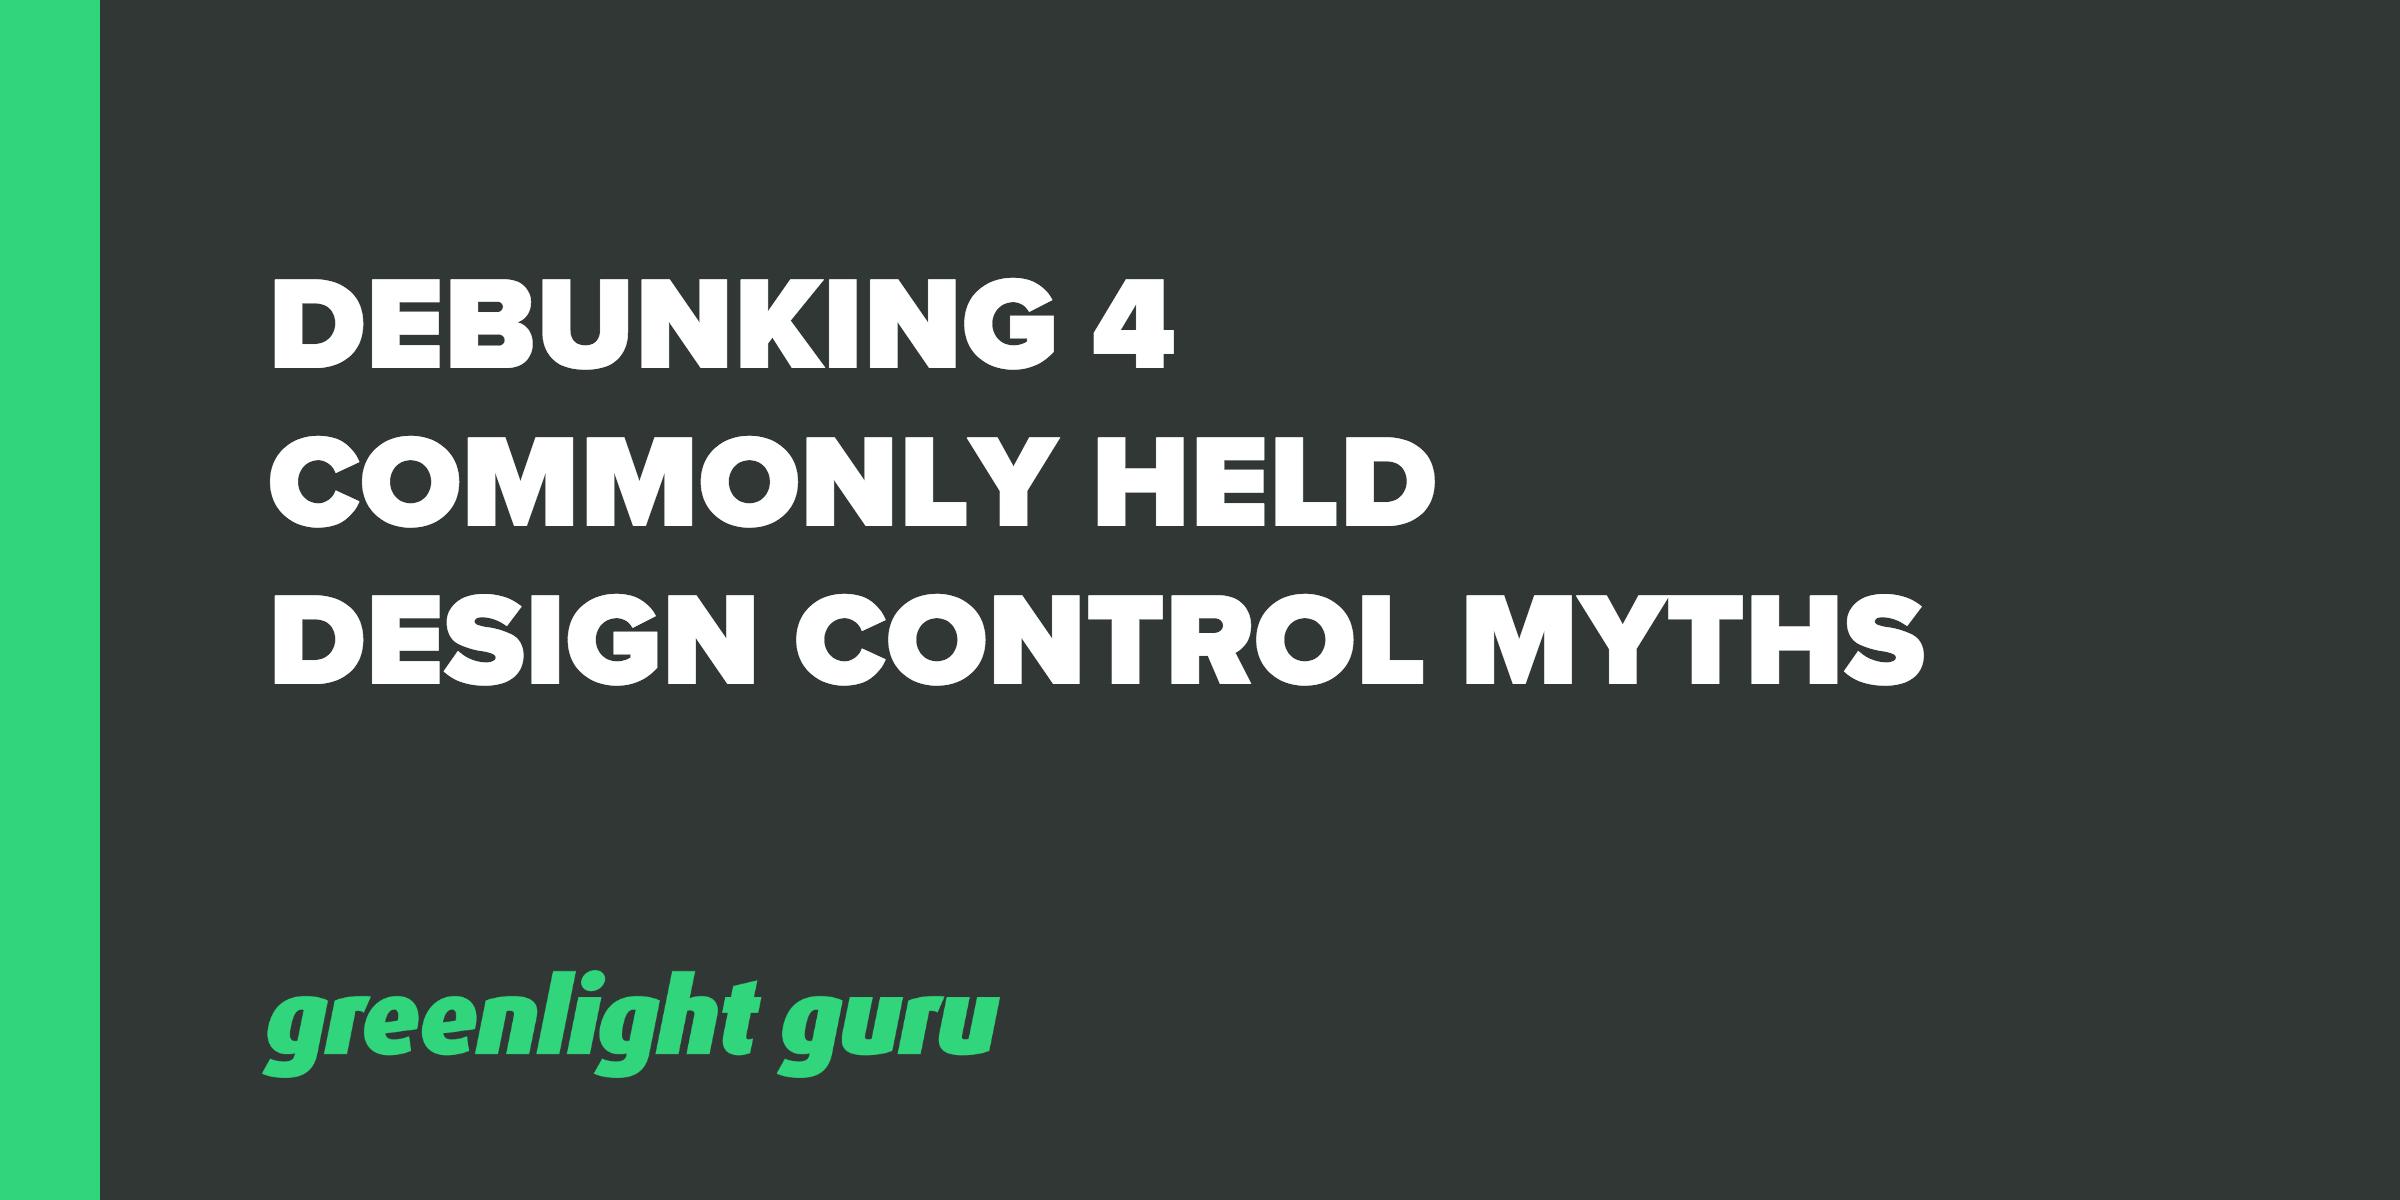 debunking 4 myths